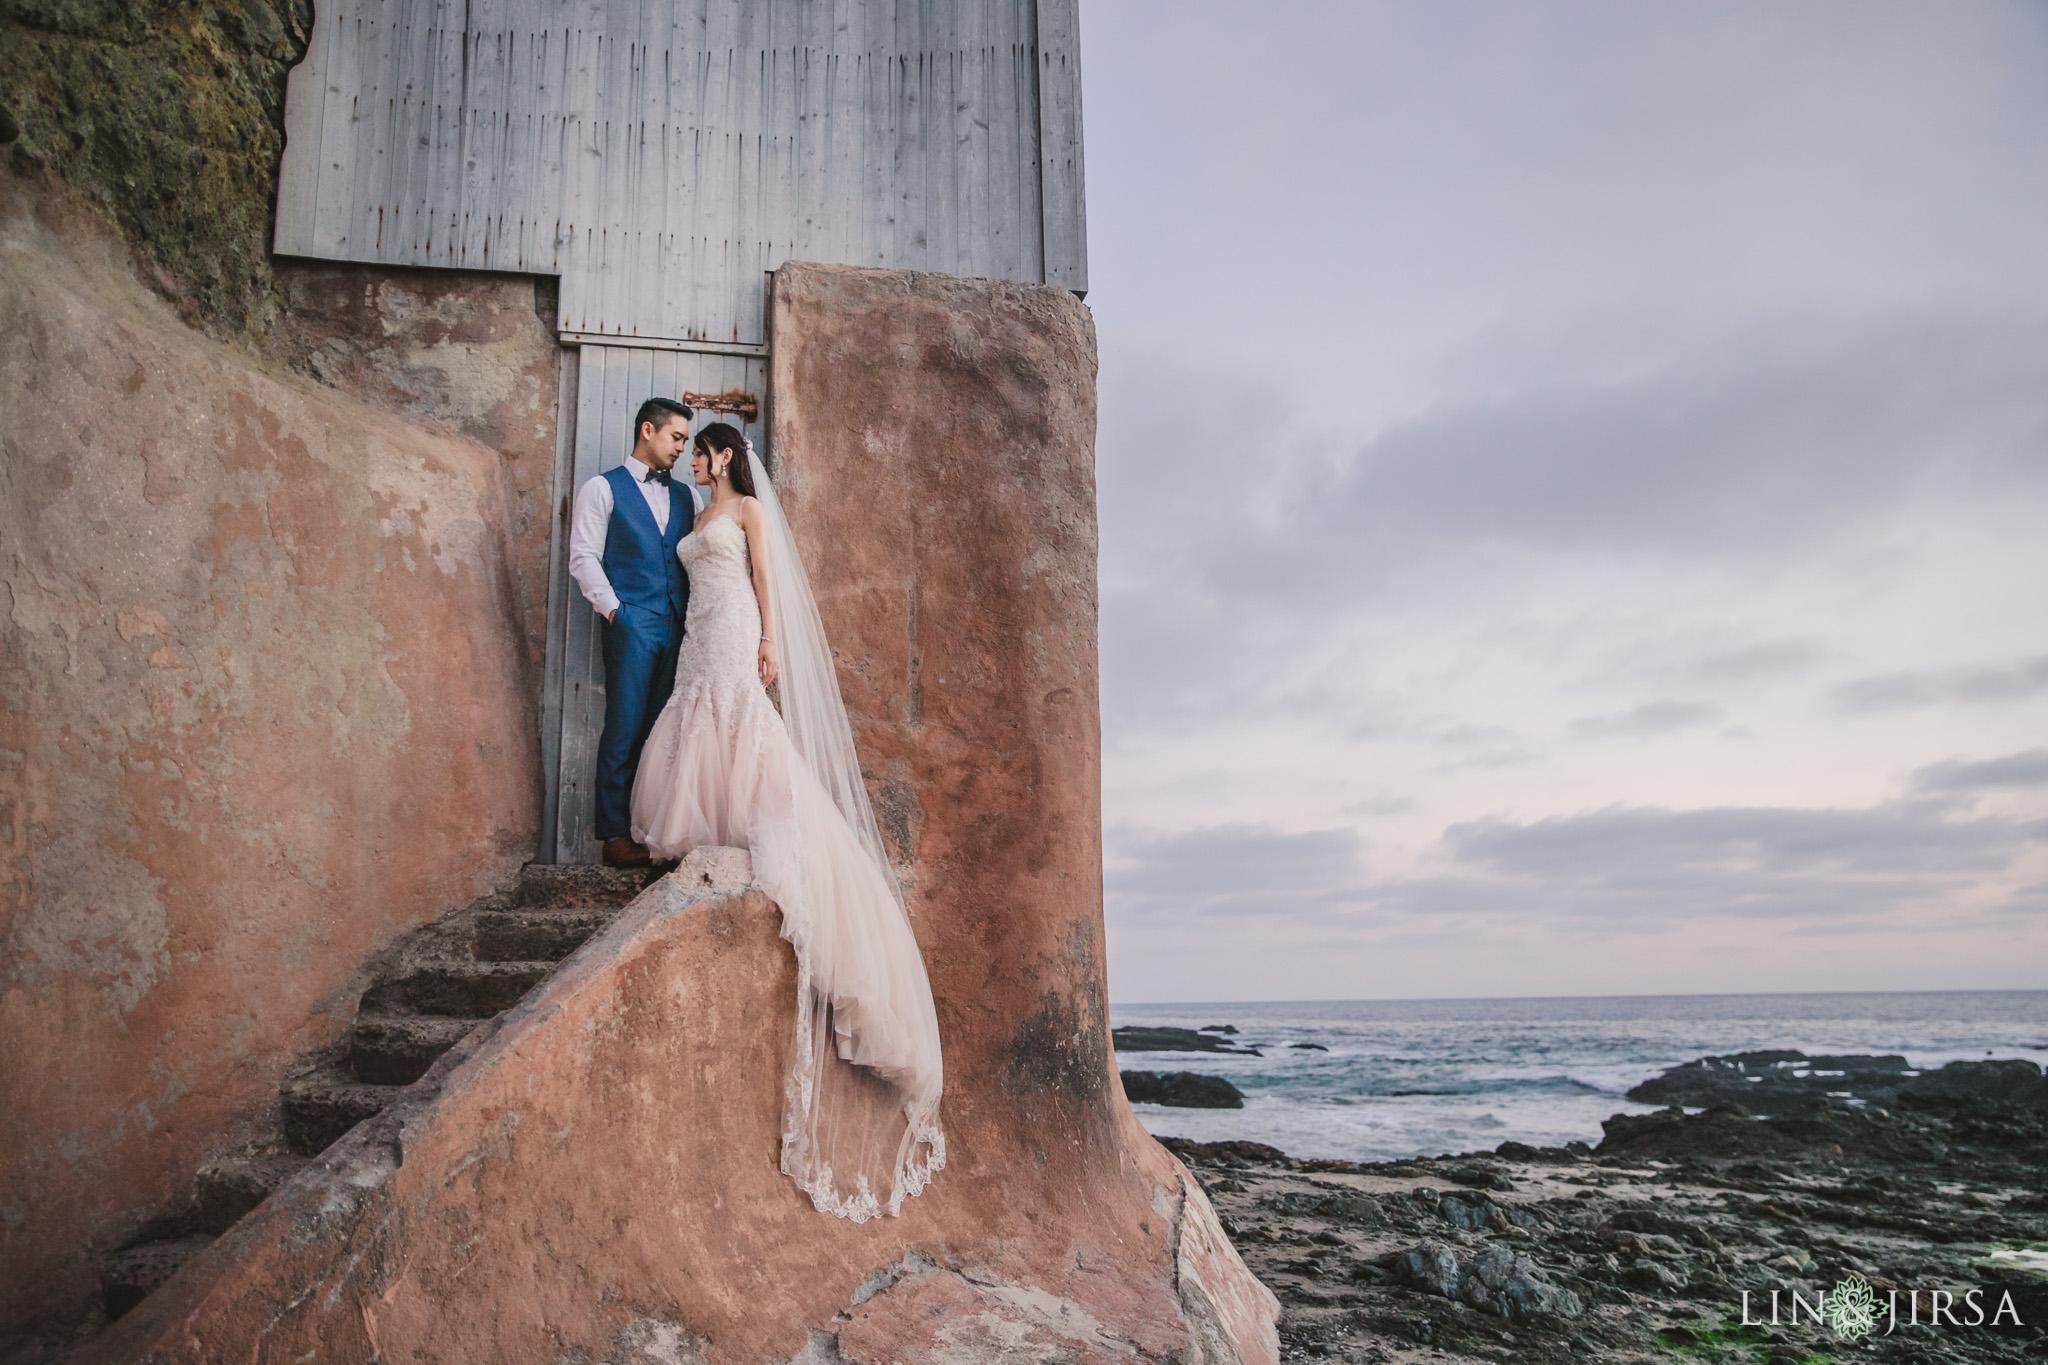 011 victoria beach orange county wedding dress photography